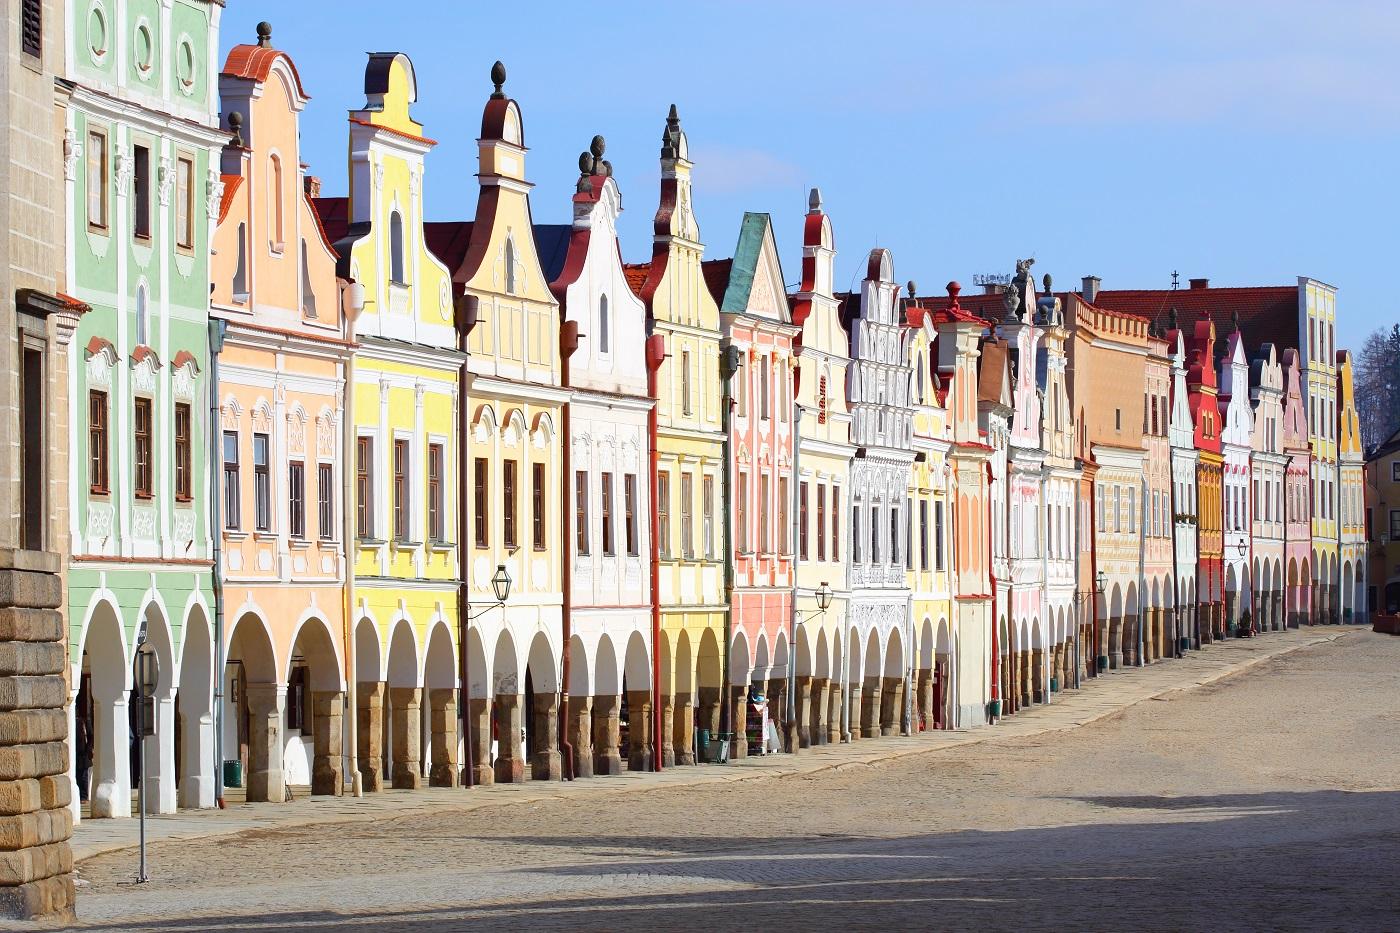 Orașul este dominat de edificiile multicolore